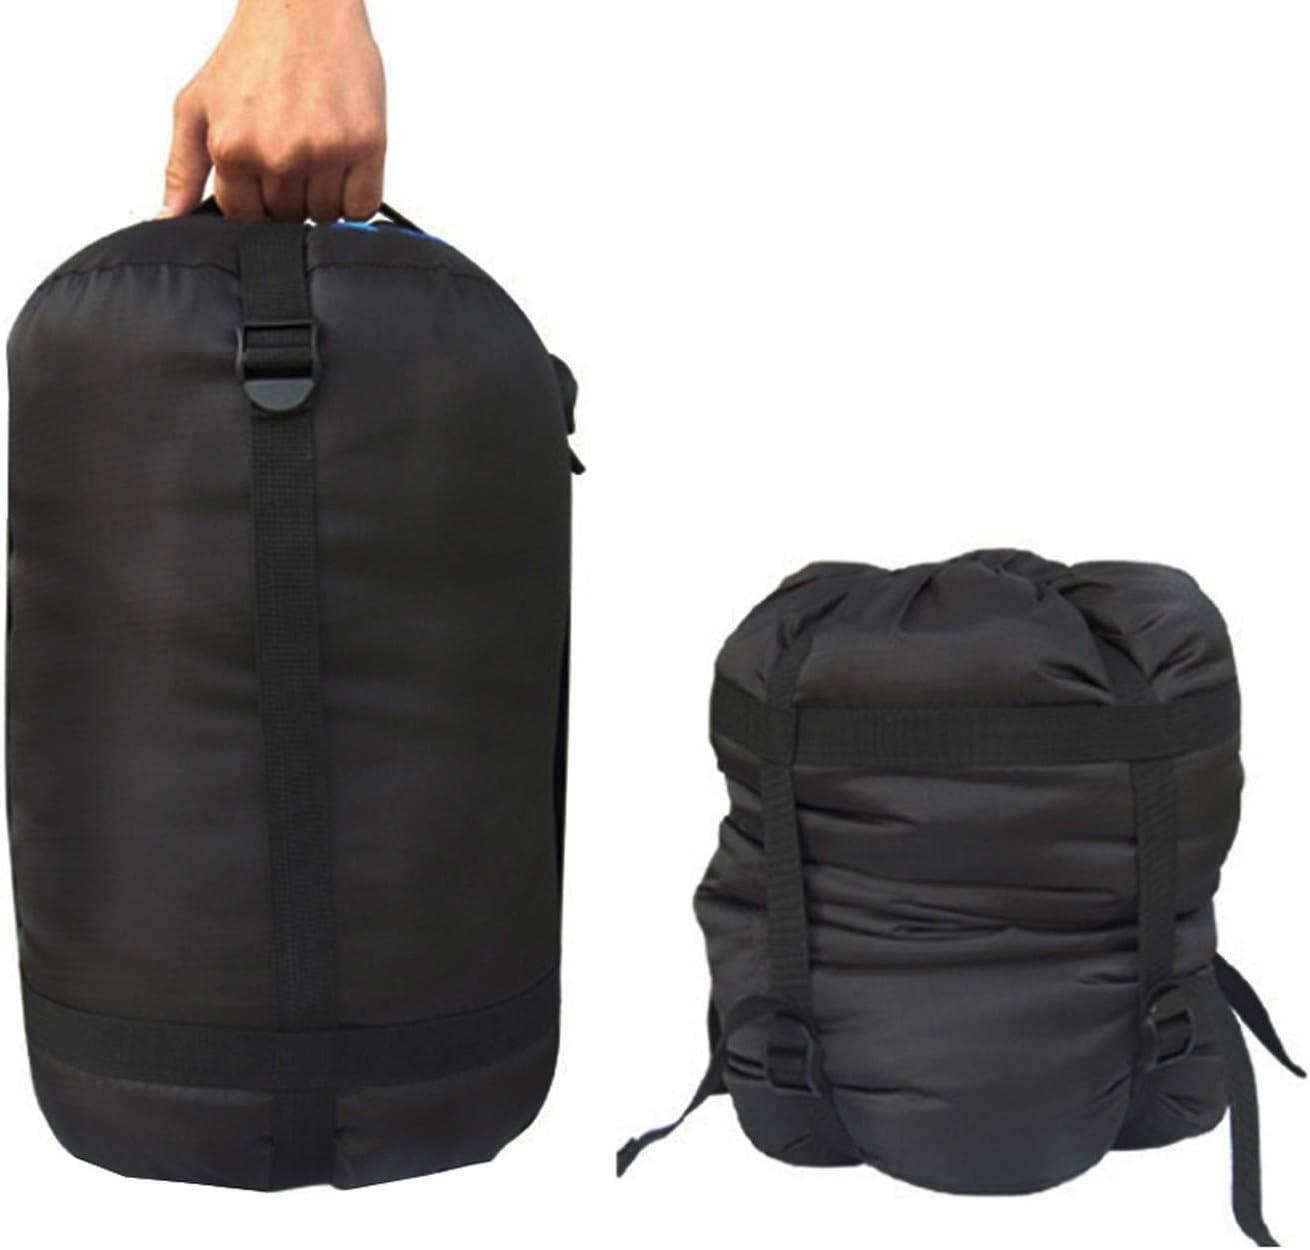 Compression Waterproof Sleeping Bag Stuff Sack Bag Light Camping Bag Cover Case